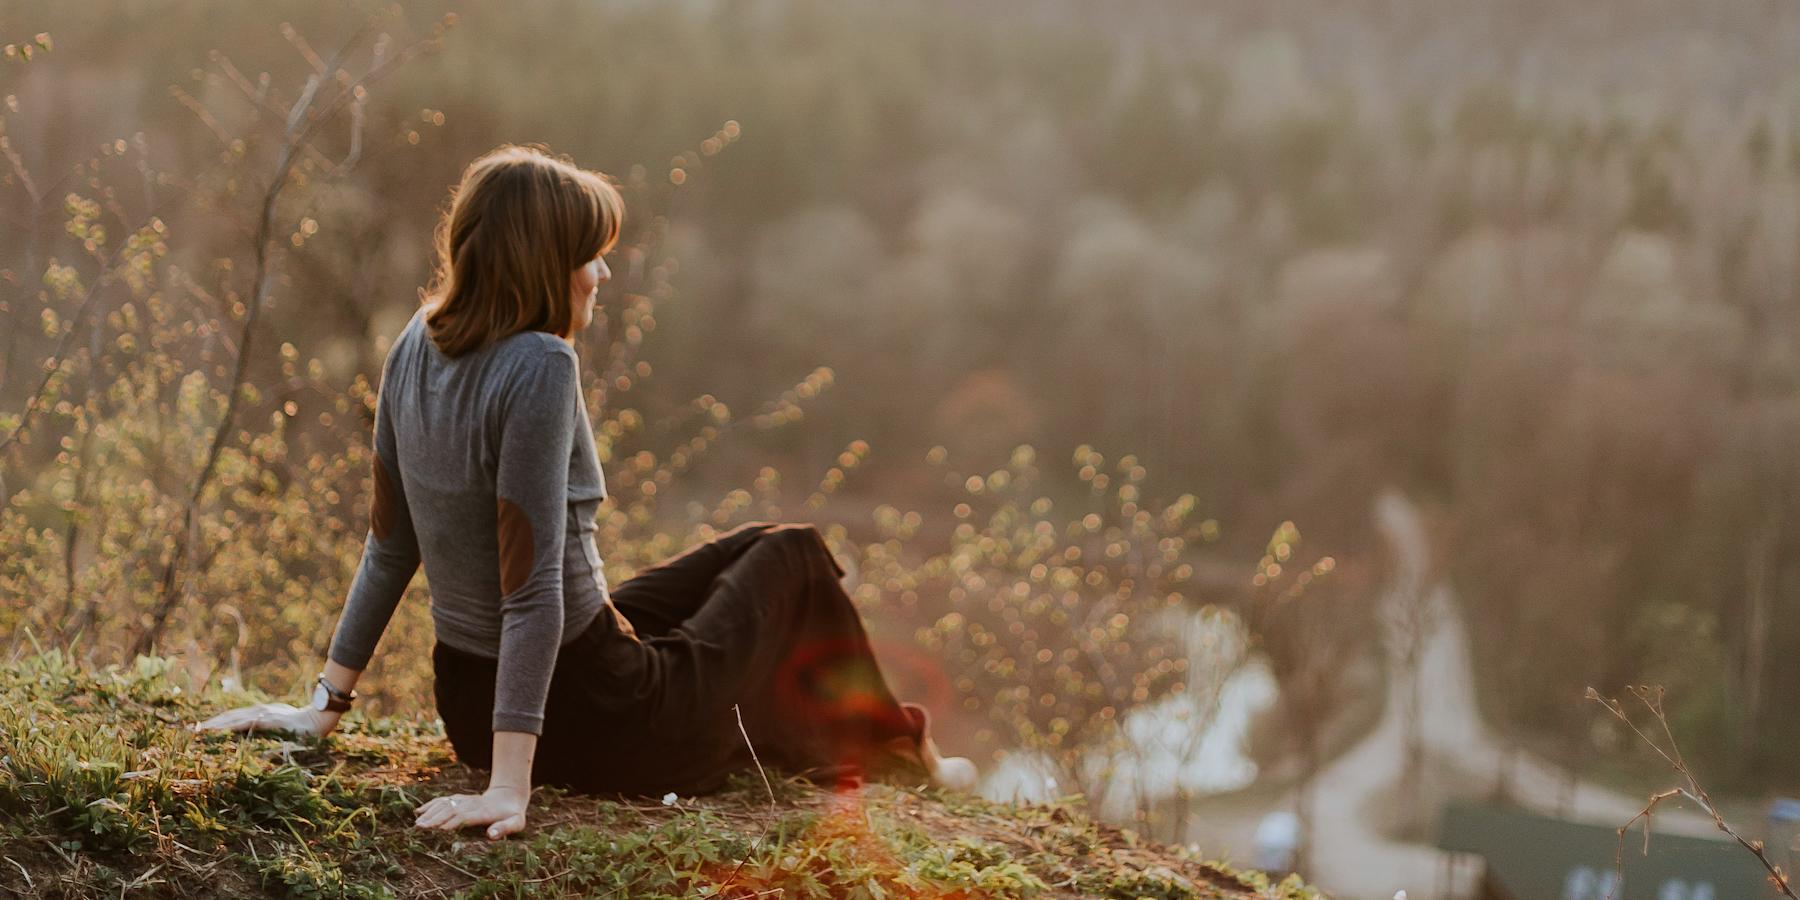 Awakening The Friend Within You